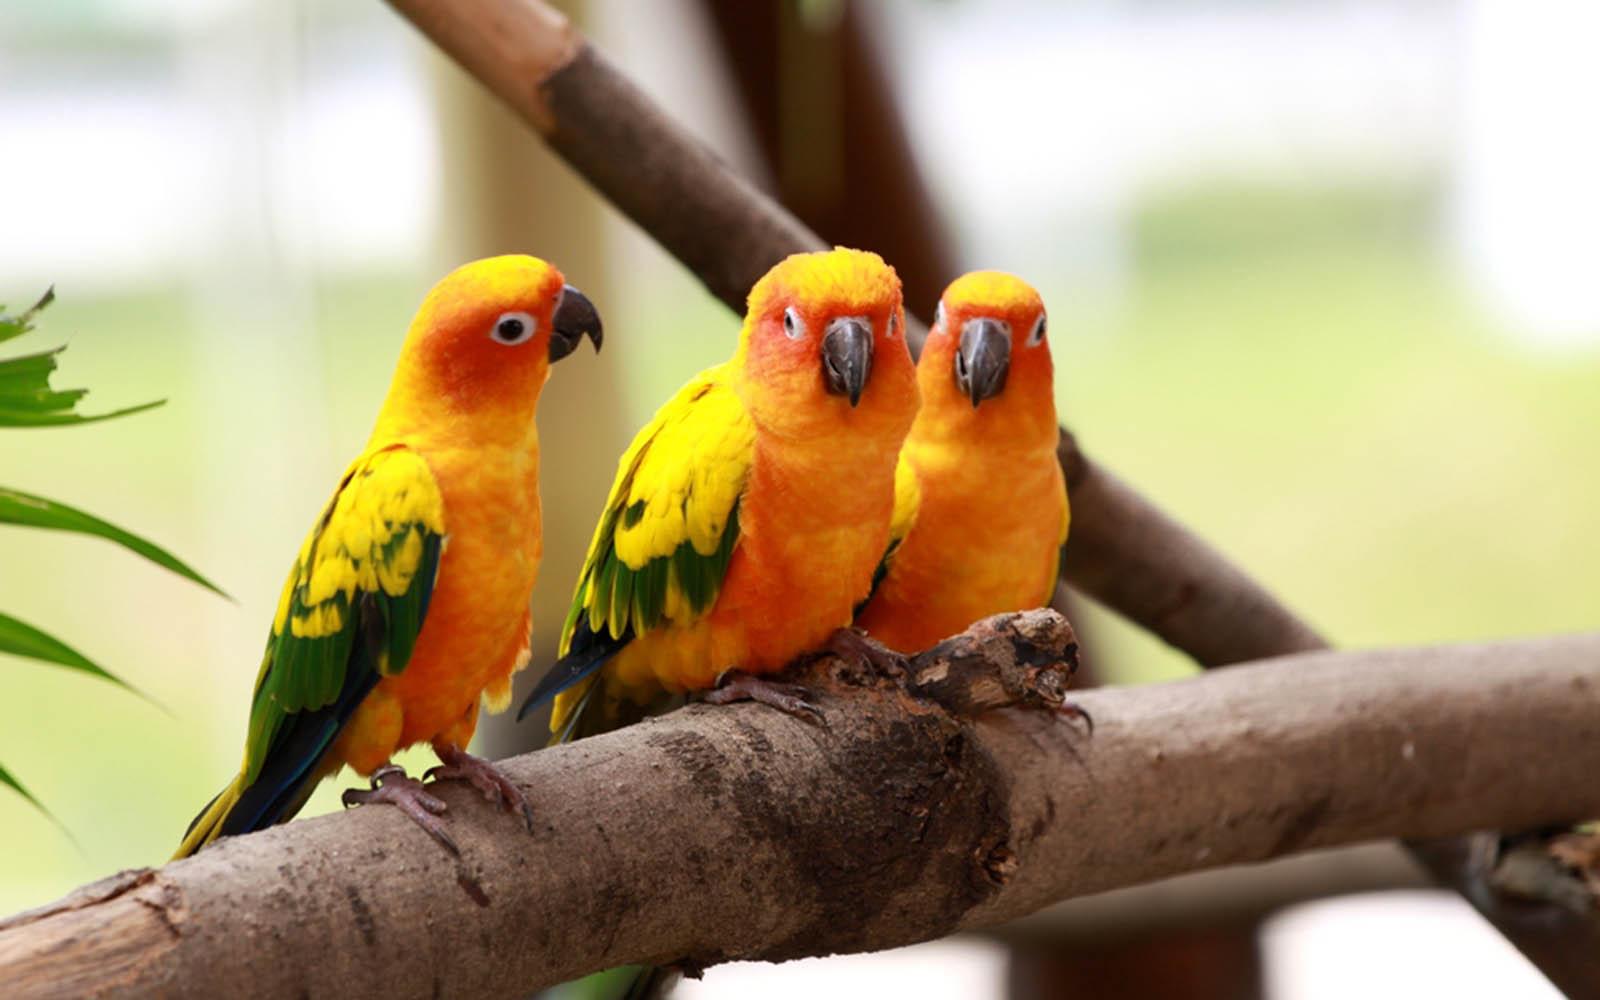 Gallery Mangklex: Love Birds Wallpapers